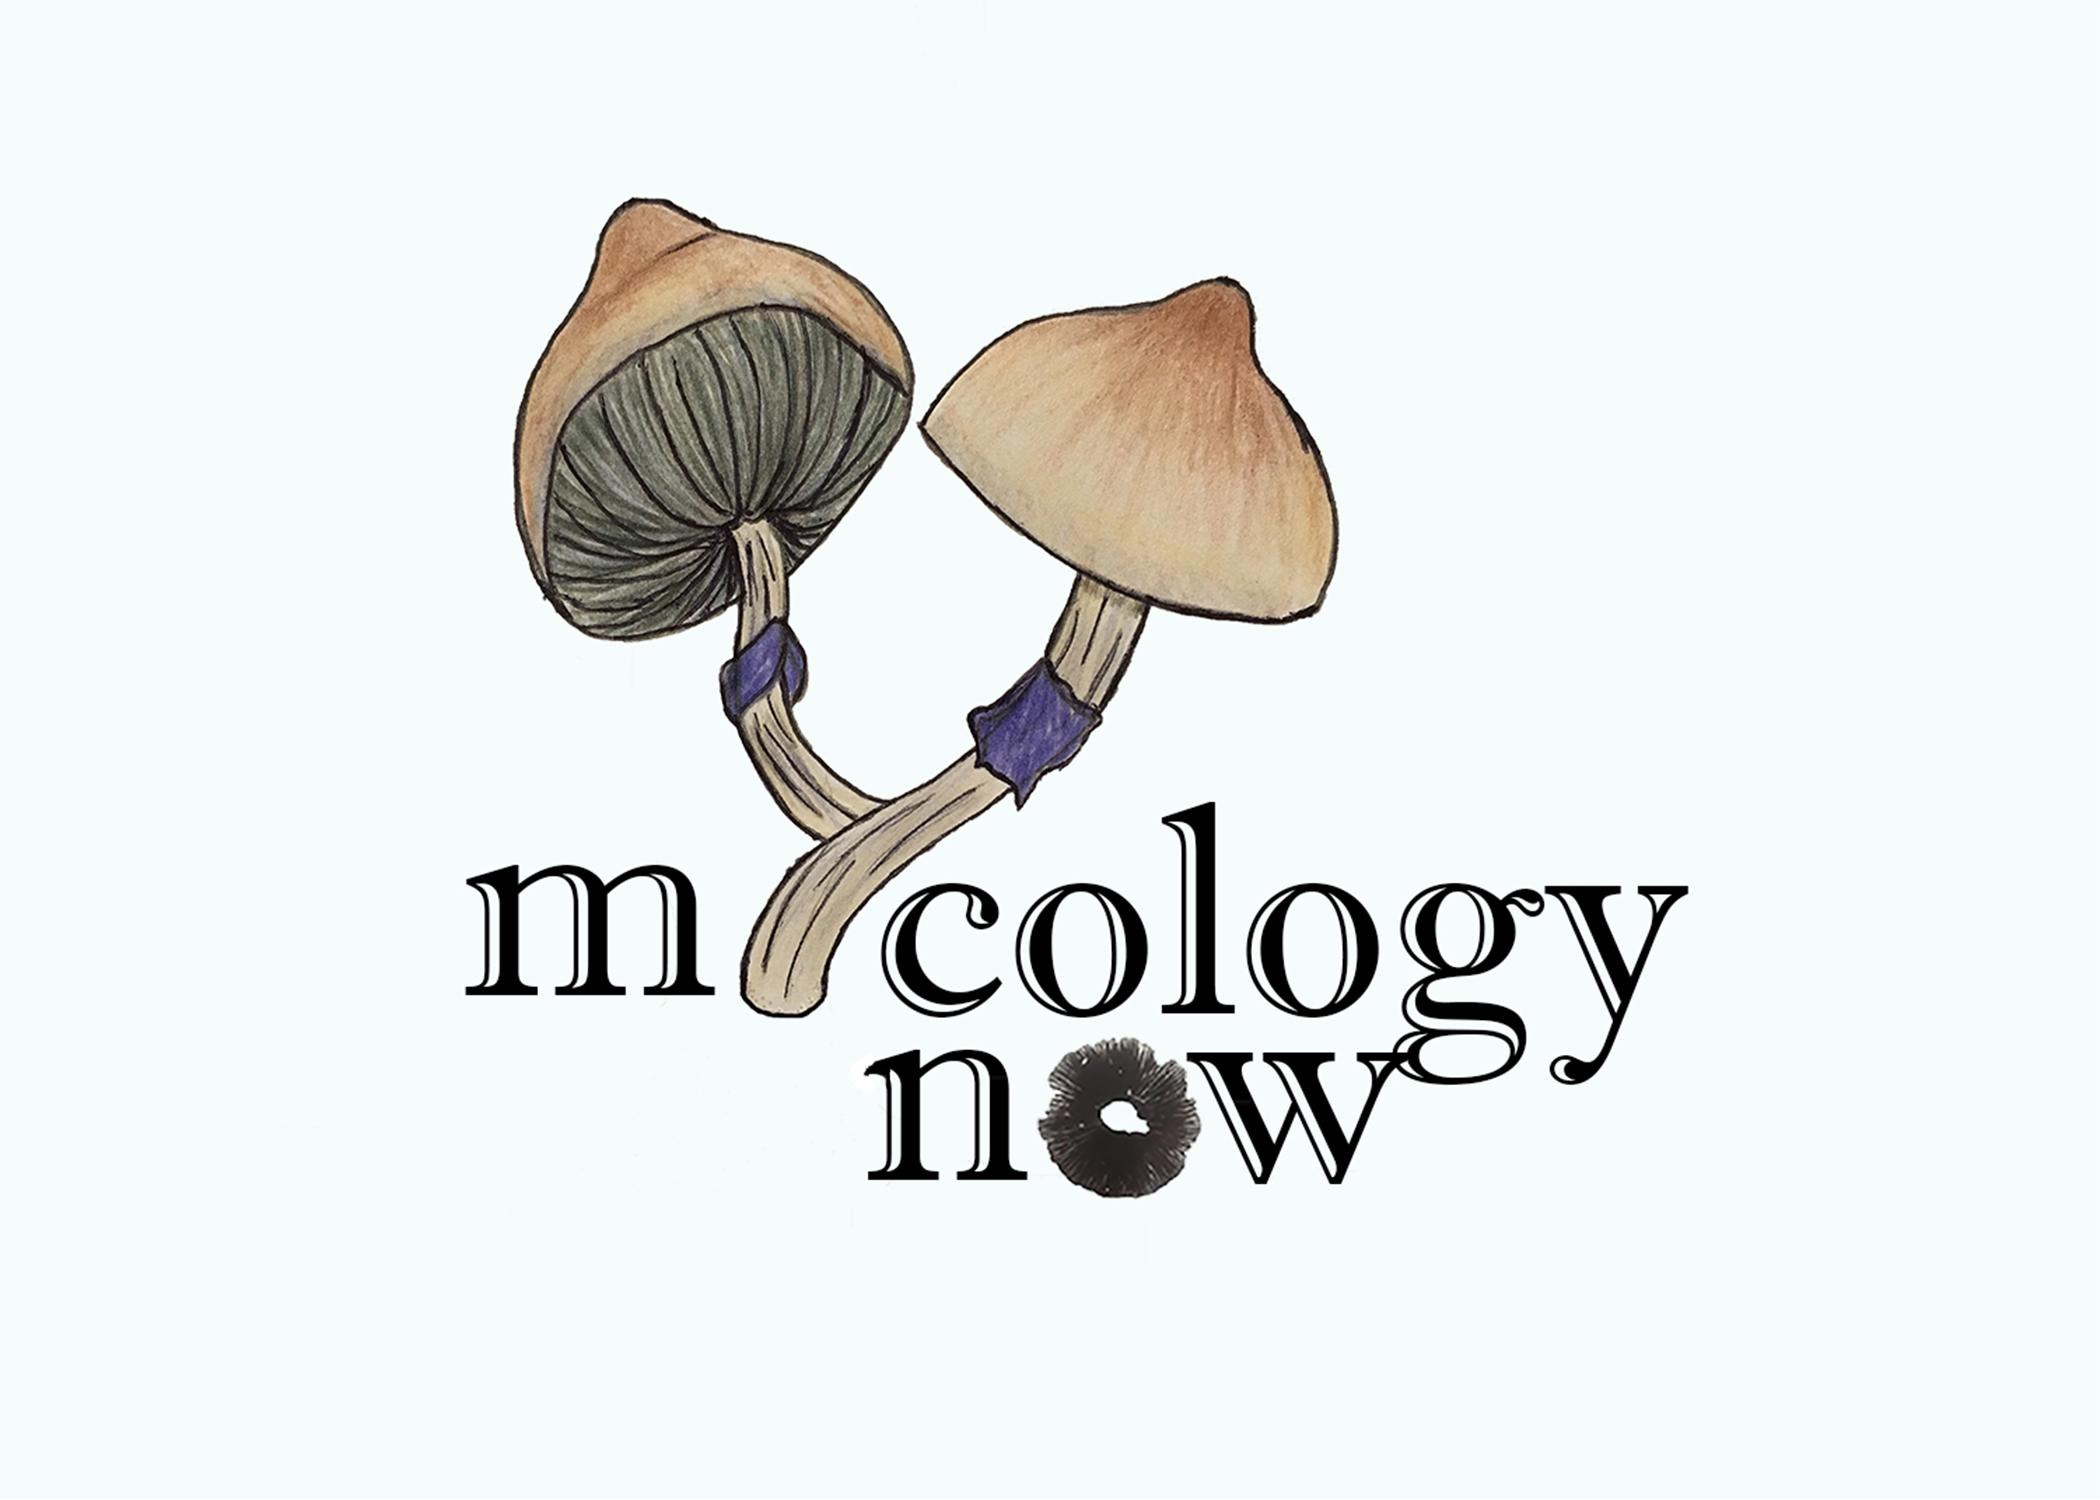 Spore Syringes' Microscopy | Mycology Now